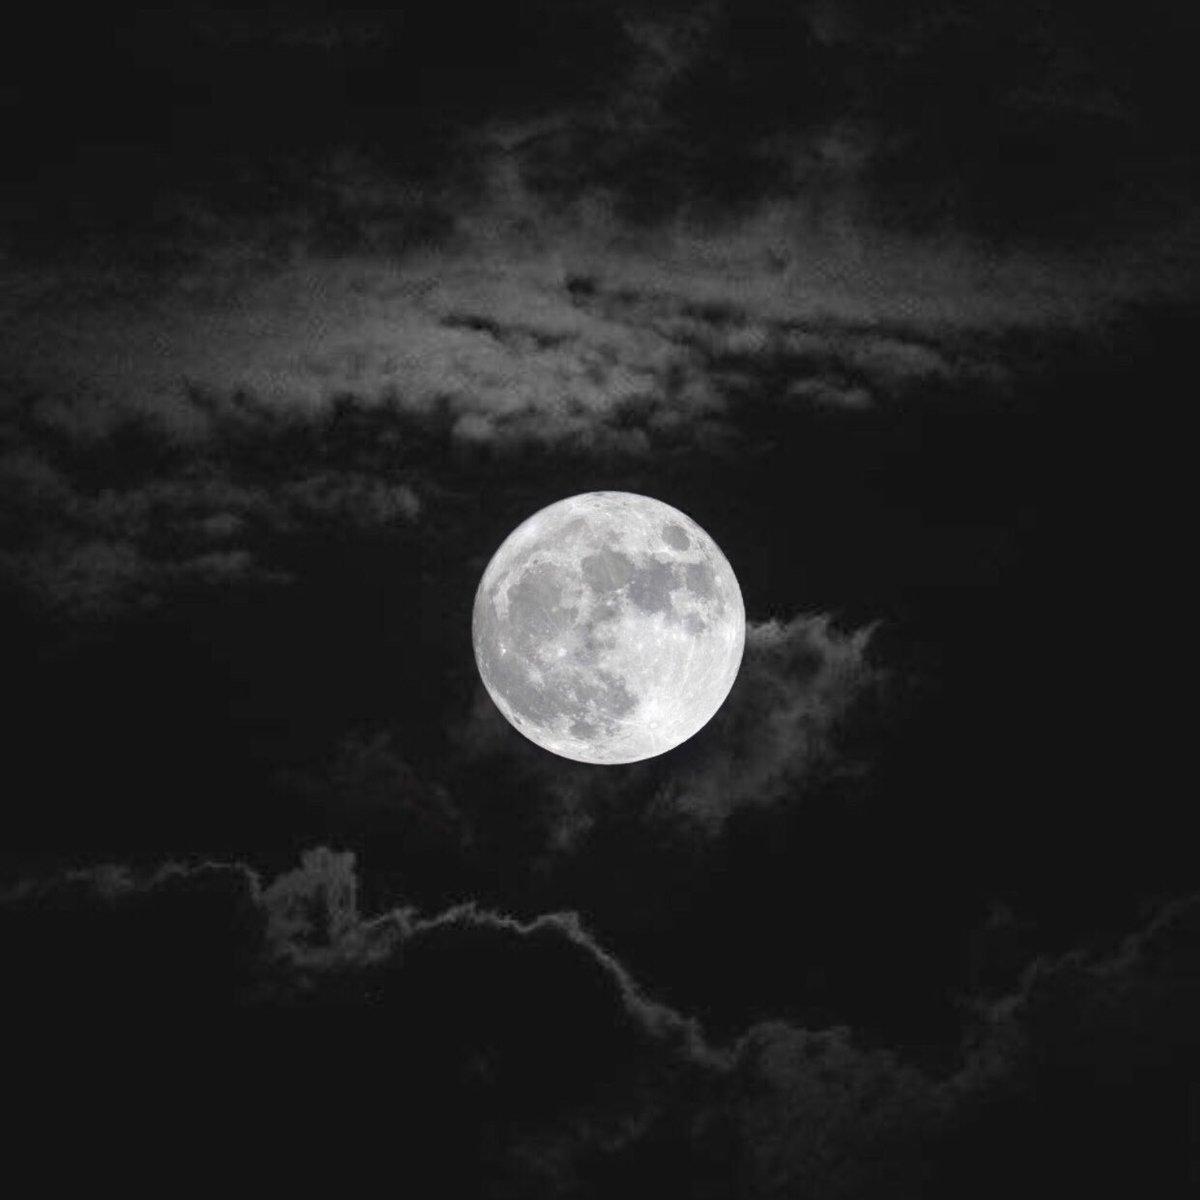 "Replying to @ih2mza: ""أنا من هؤلاء الذينَ ينتمون إلى الليل والقمر والبَحر"""